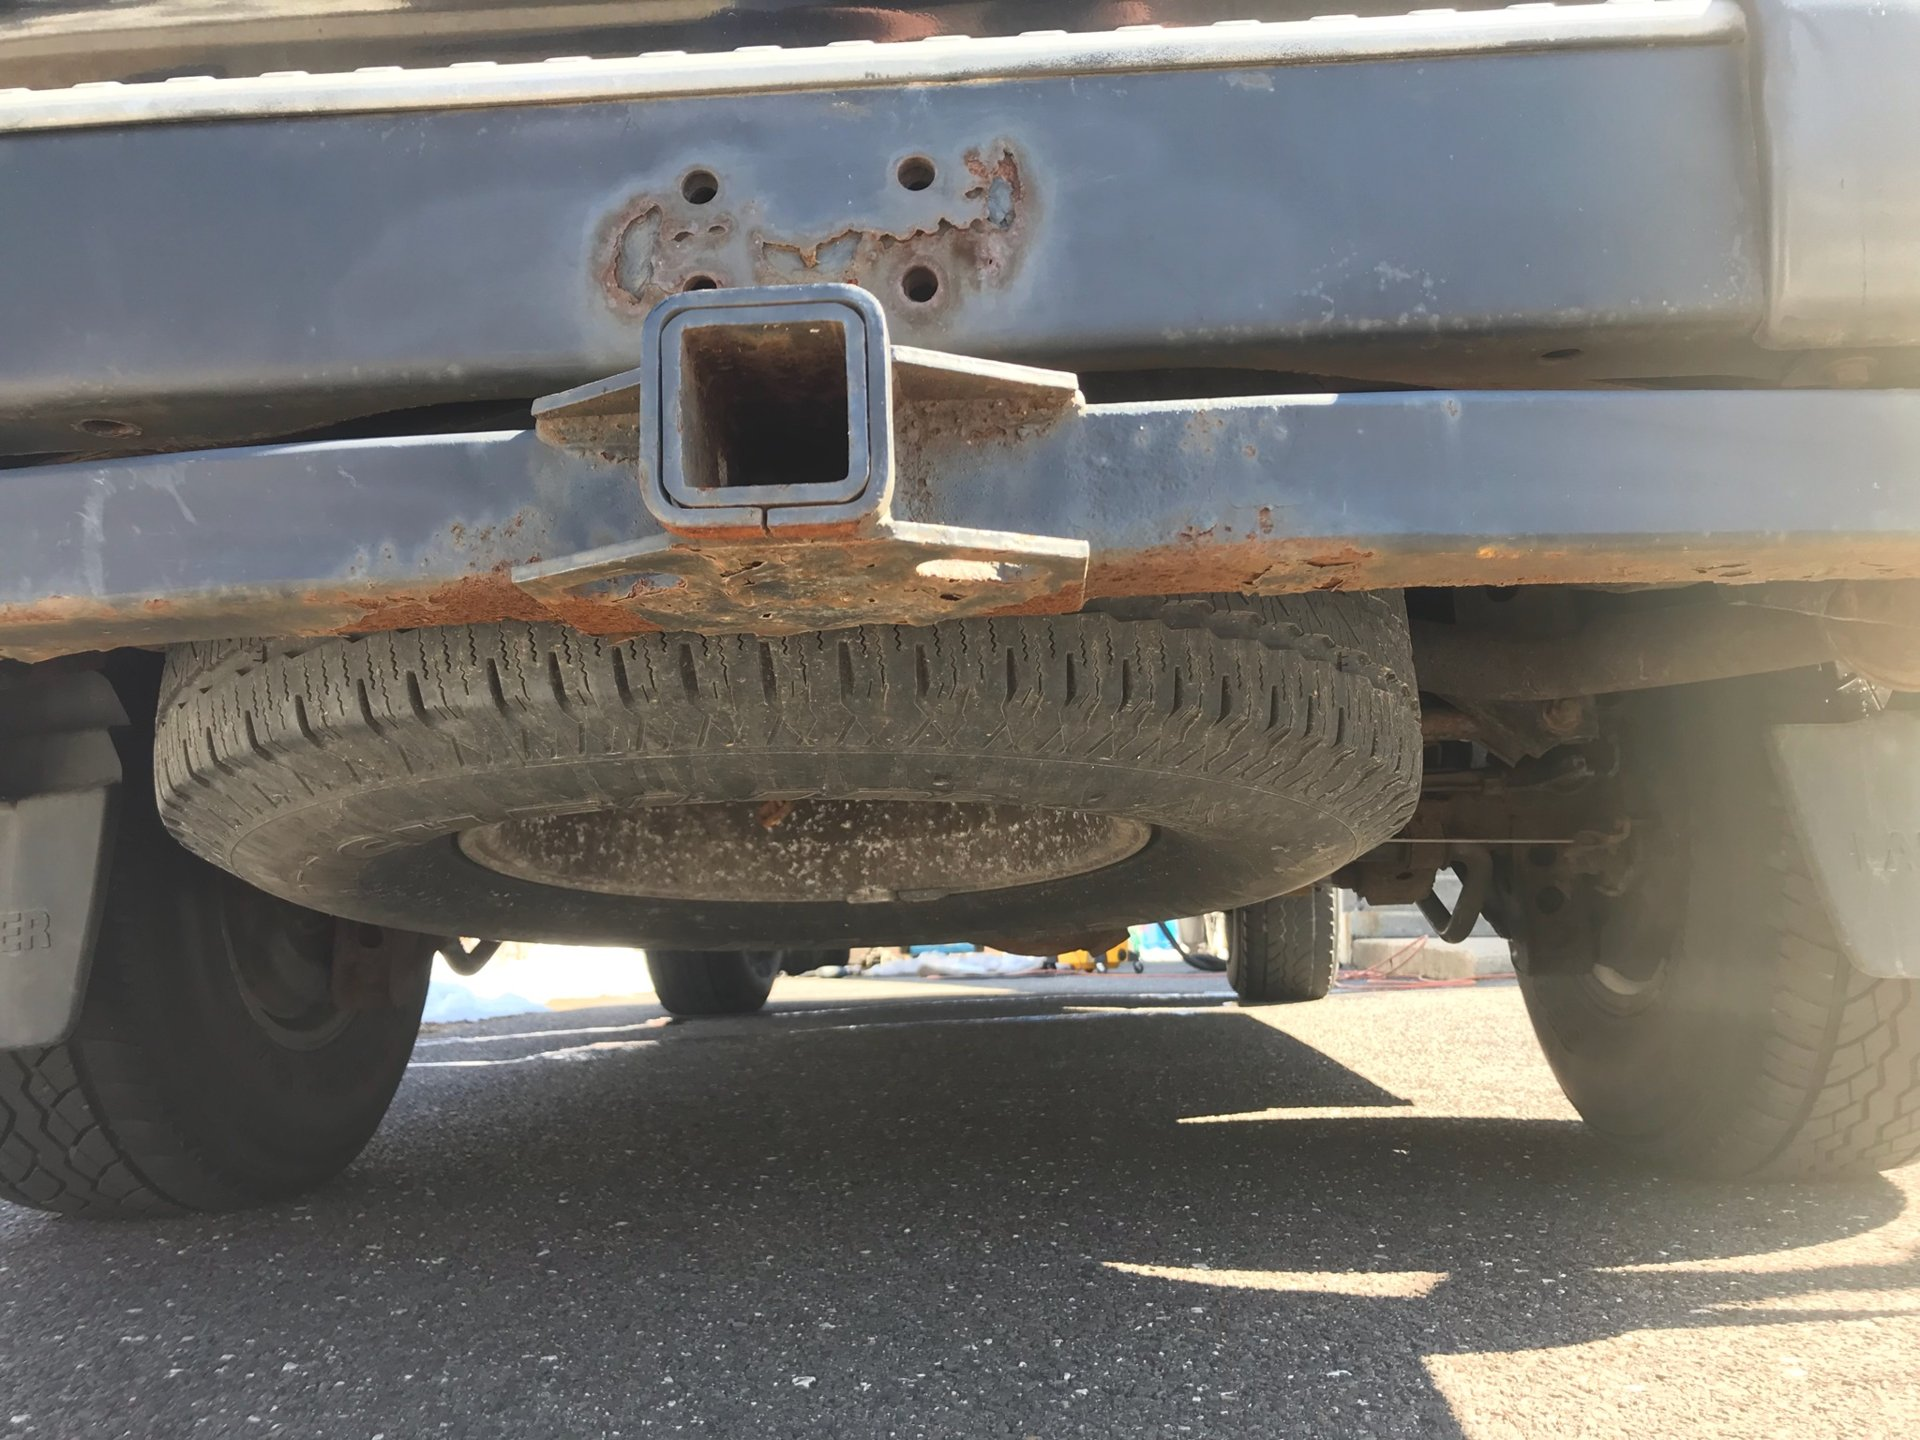 Toyota Lebanon Pa >> $4400, locked, 197k PA rust. Worth it? | IH8MUD Forum